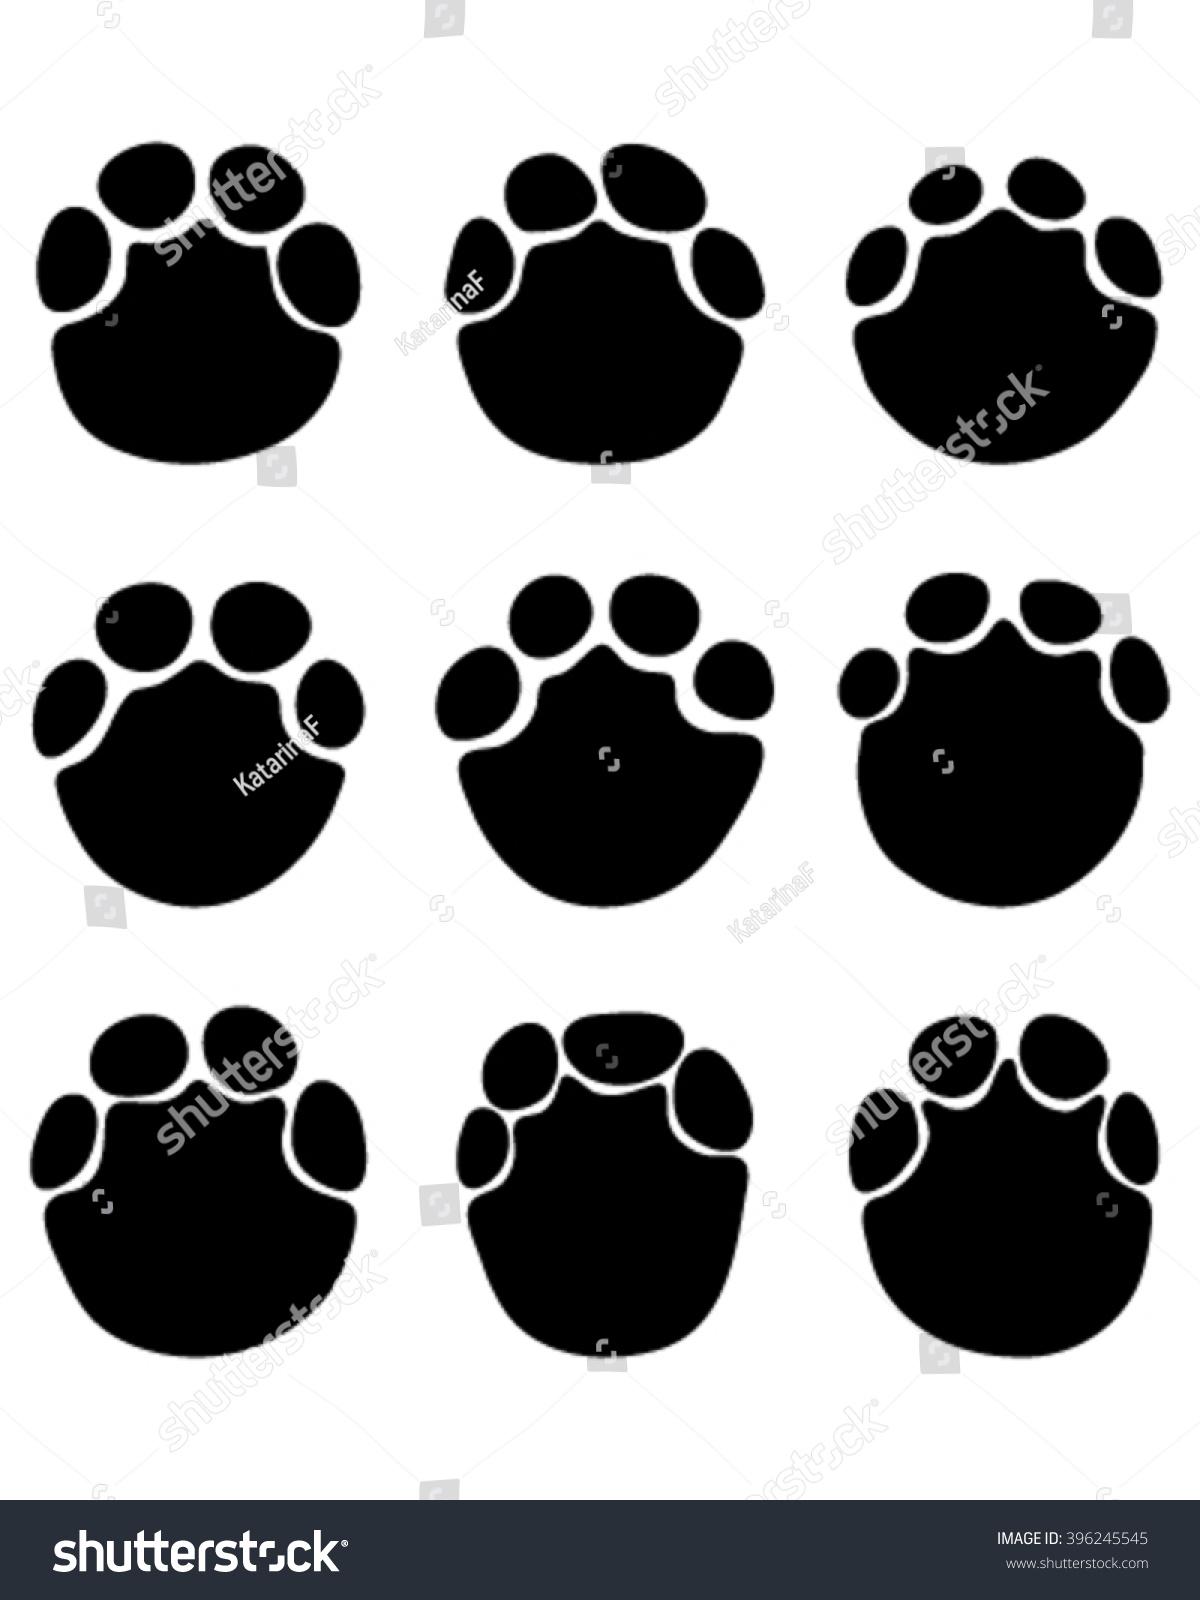 Black Print Paws Elephant Vector Stock Vector 396245545 ...